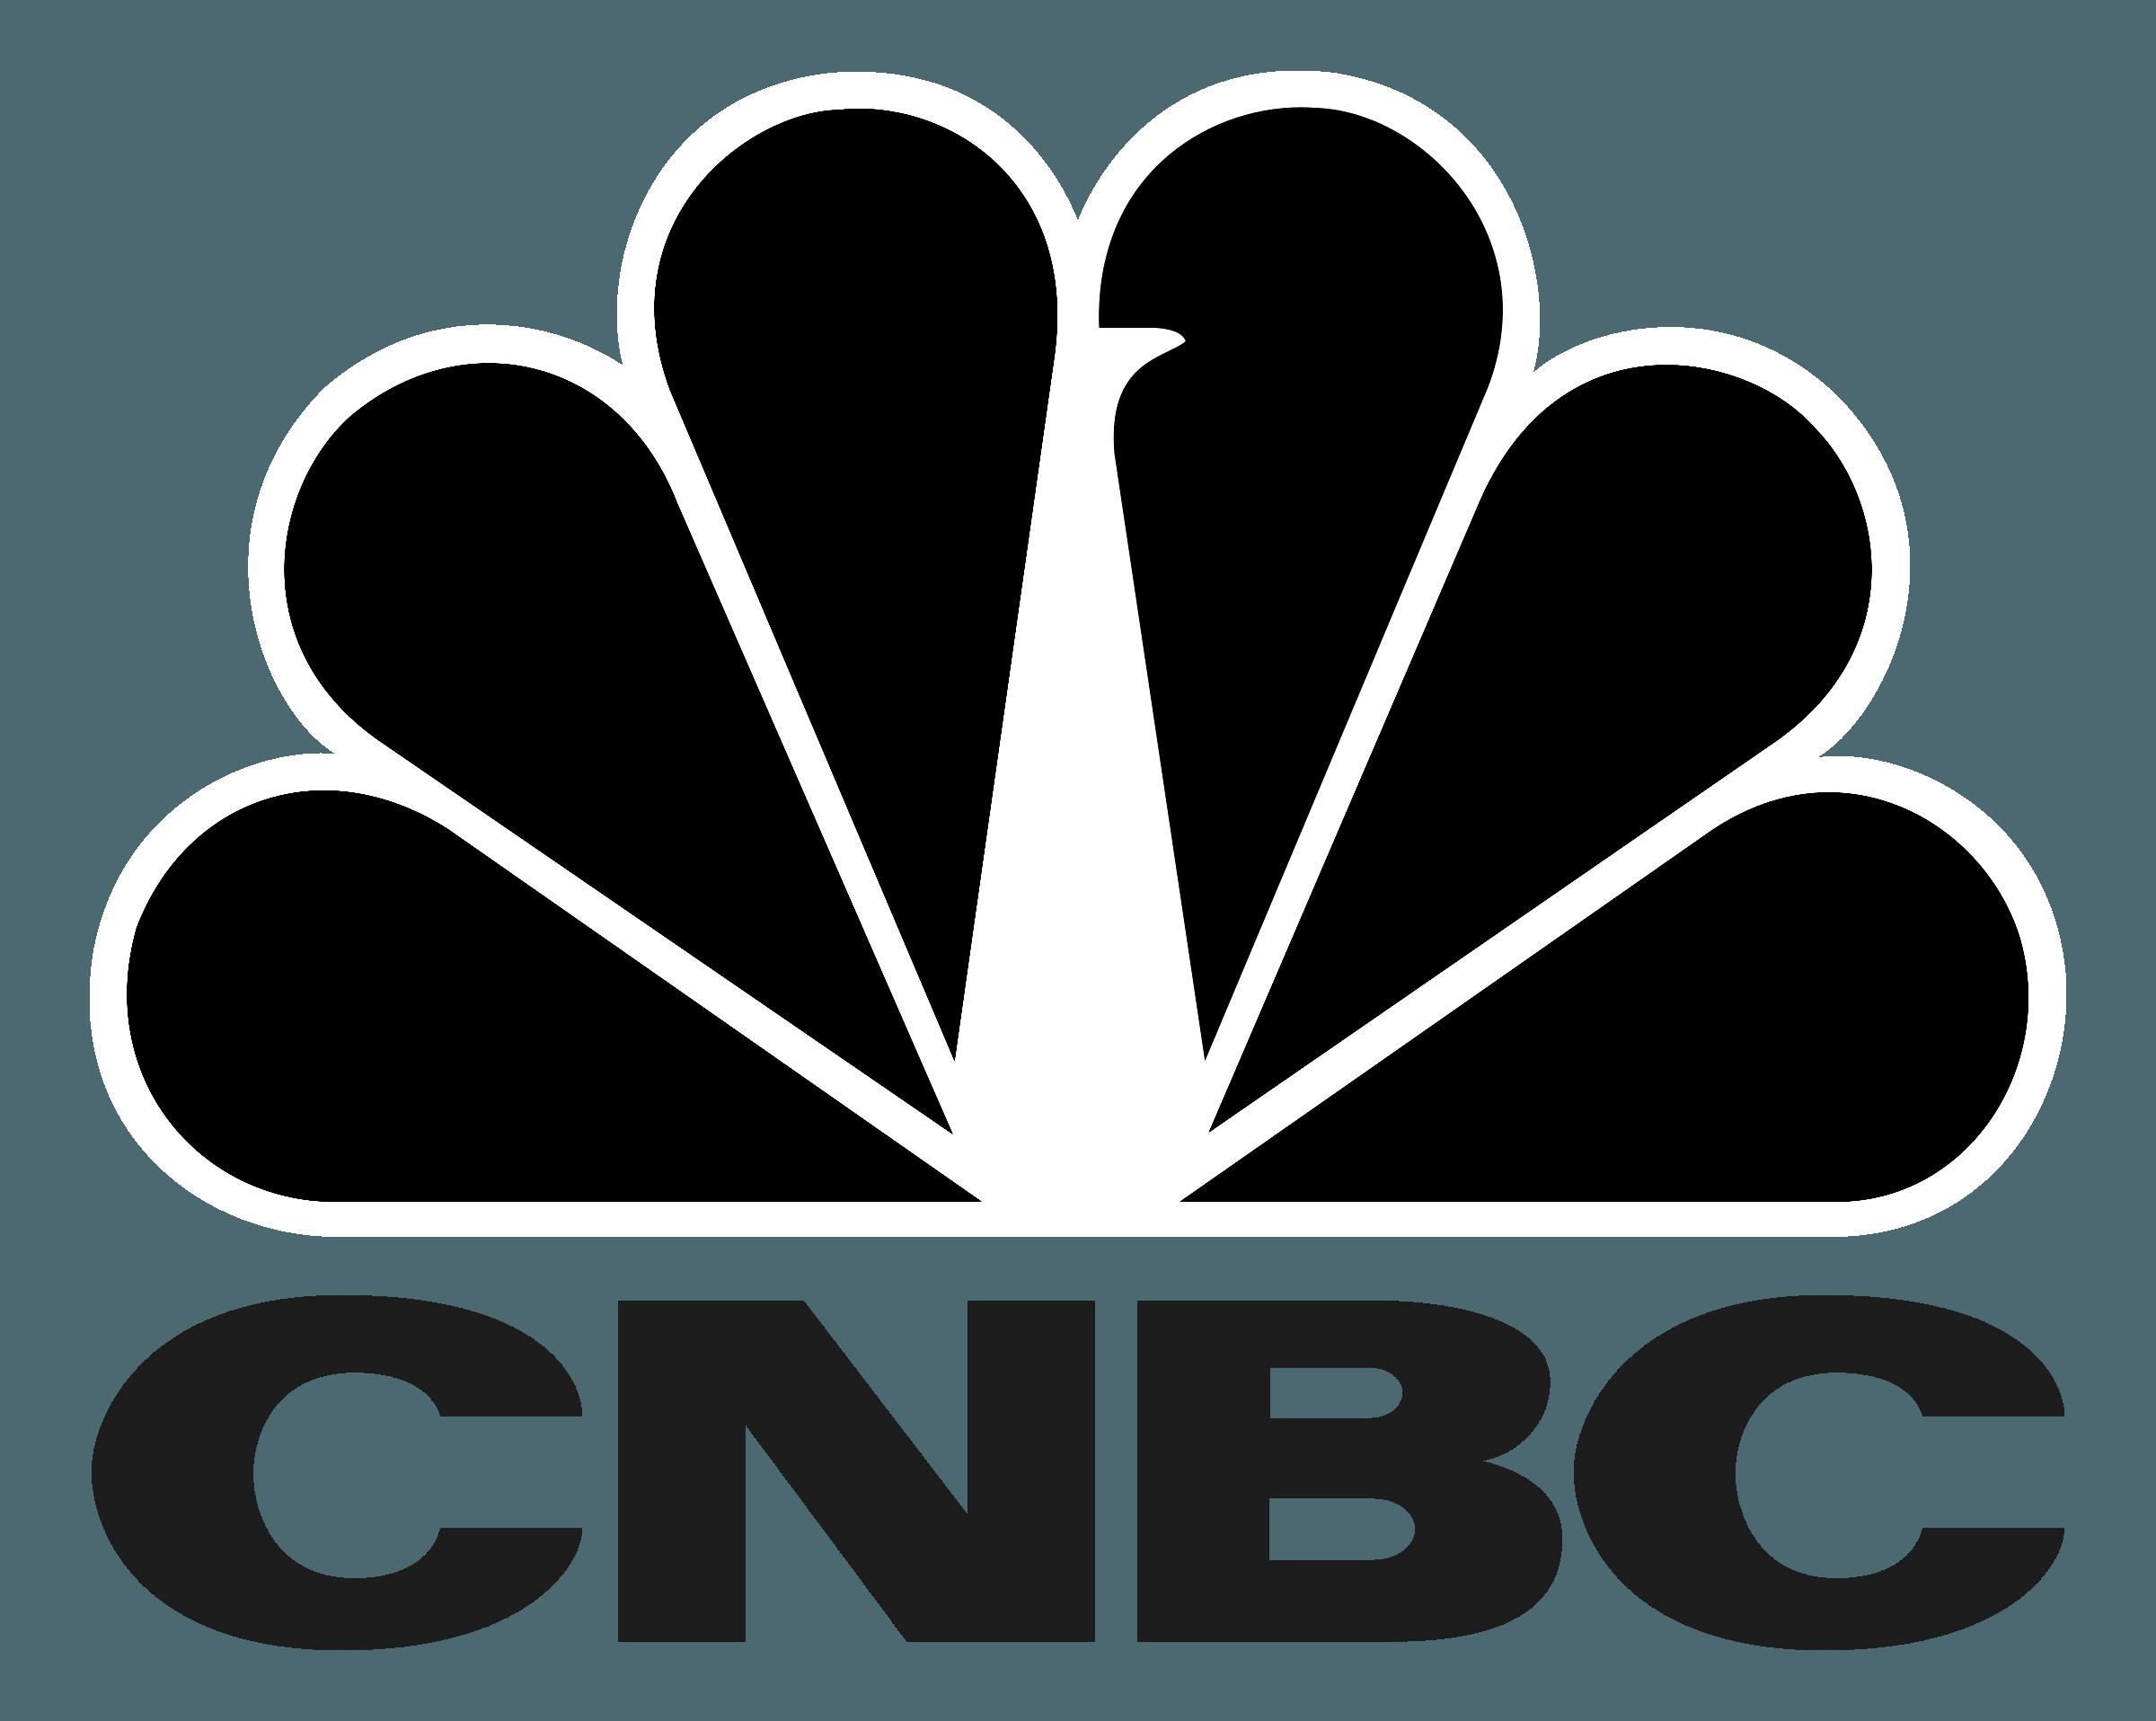 cnbc-logo-black-transparent.png